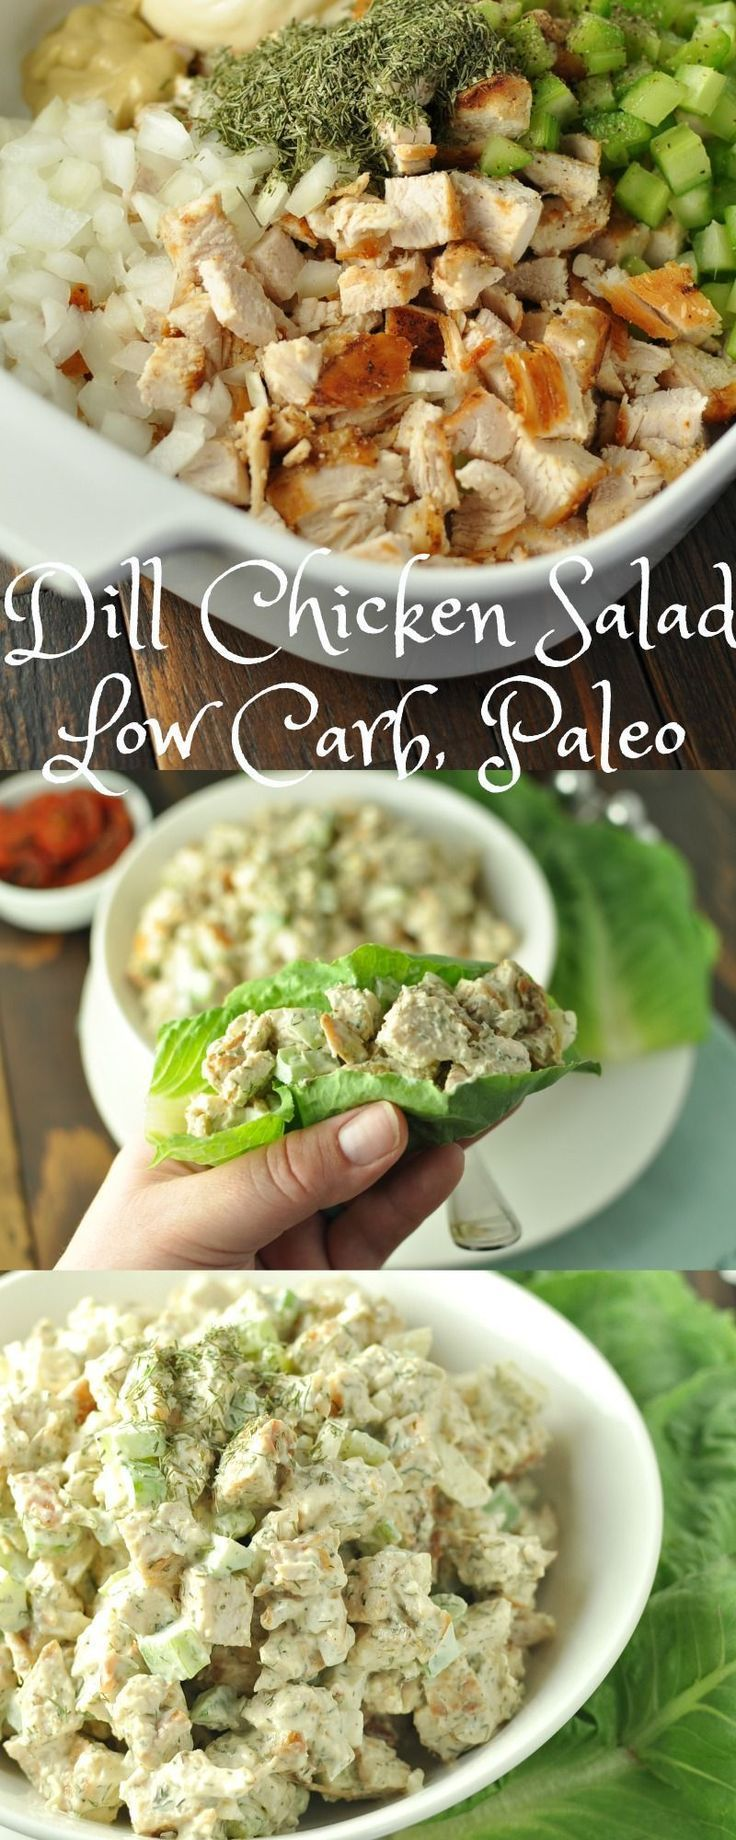 Dill Chicken Salad paleo, Whole30, Dairy Free Recipe